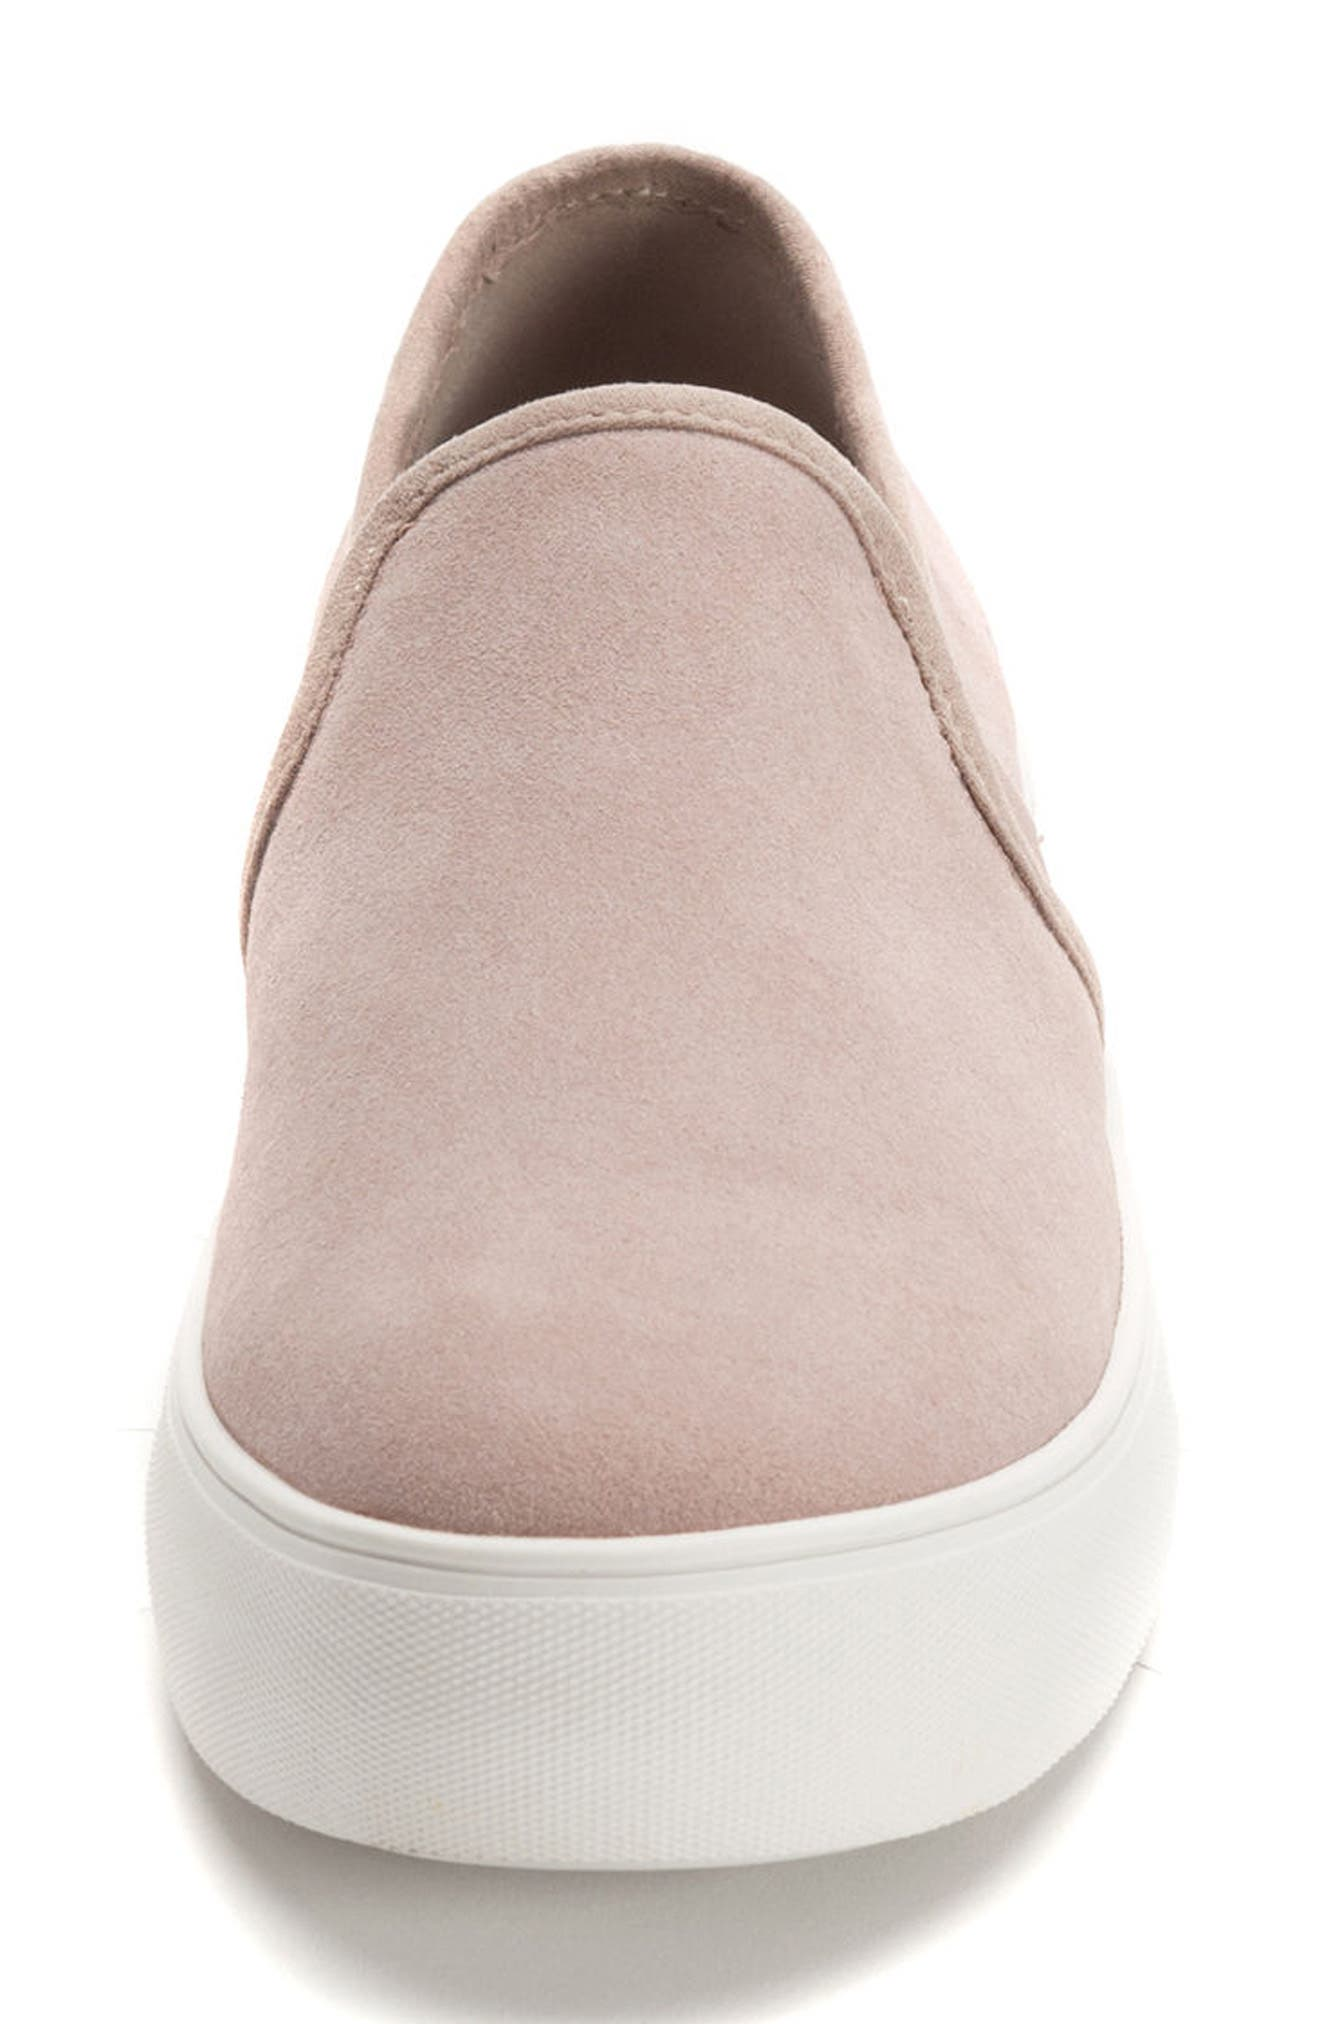 Glance Waterproof Sneaker,                             Alternate thumbnail 4, color,                             LIGHT PINK SUEDE